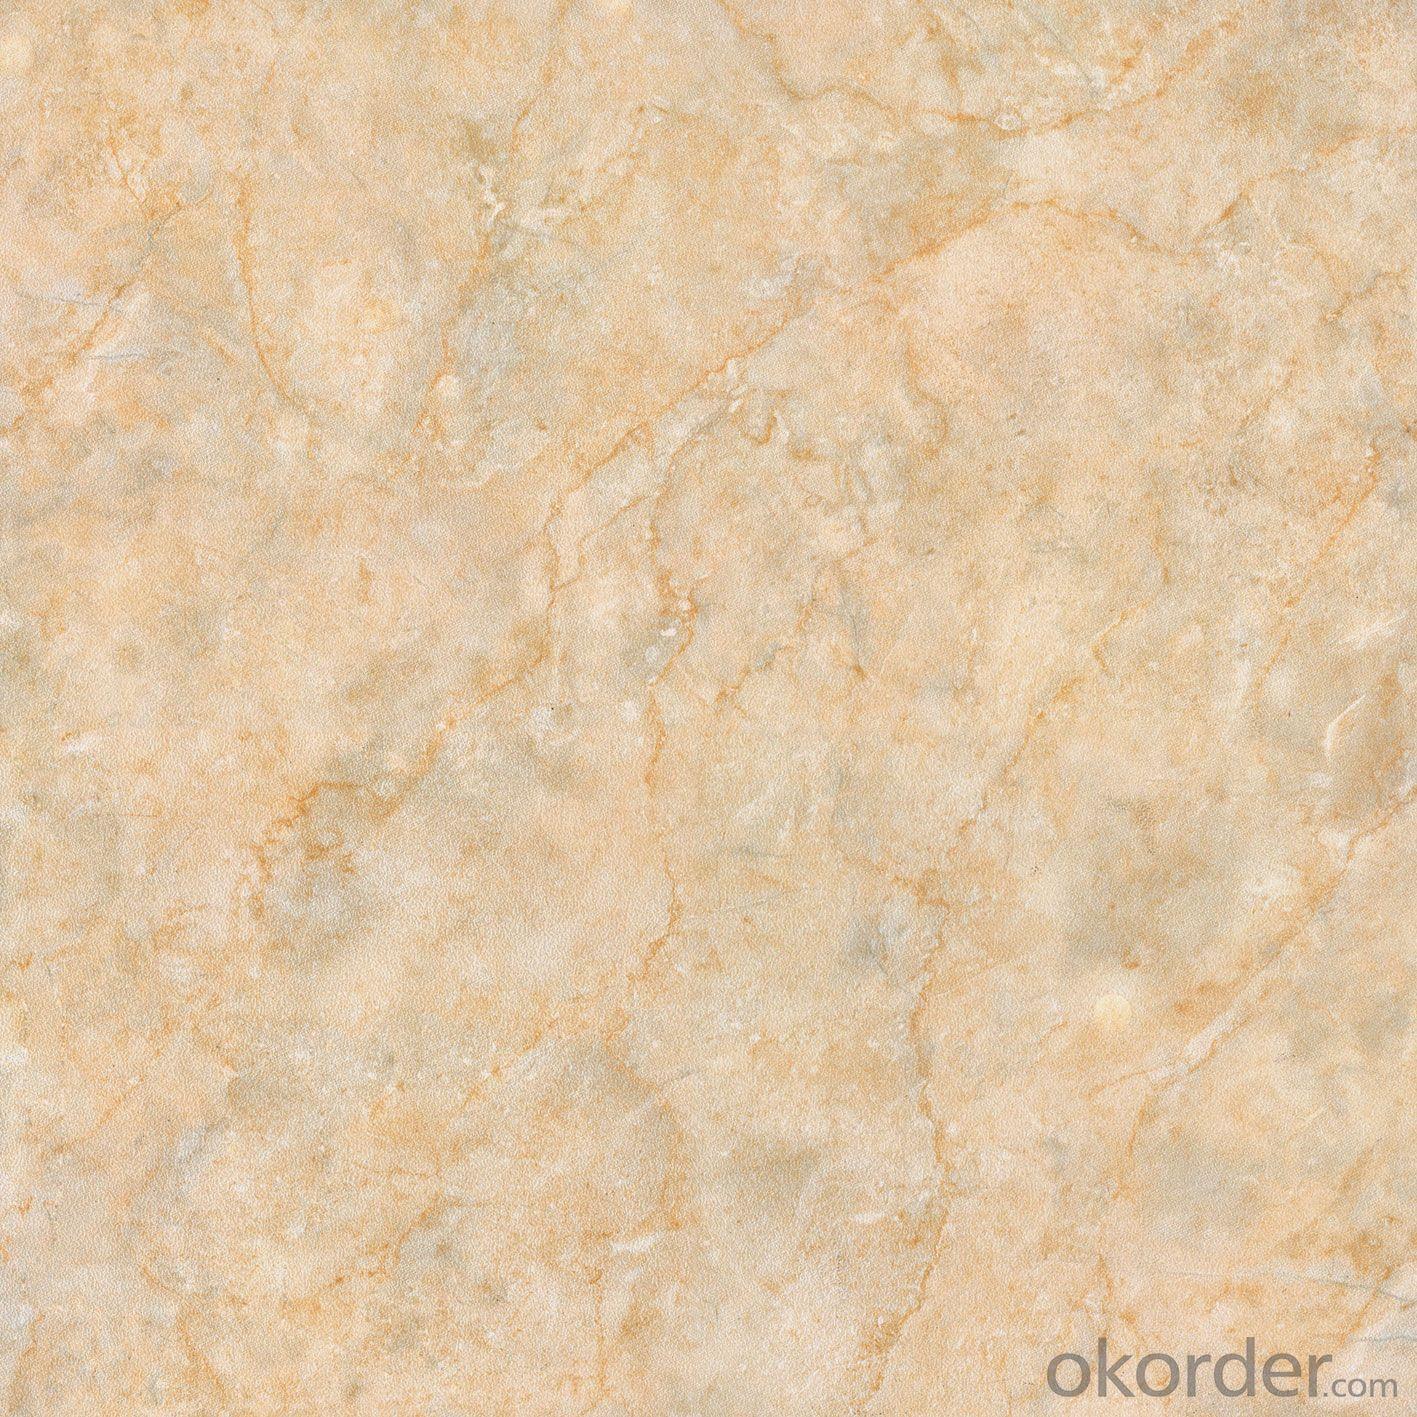 Glazed Porcelain Floor Tile 600x600 mm CMAX-LY6031P